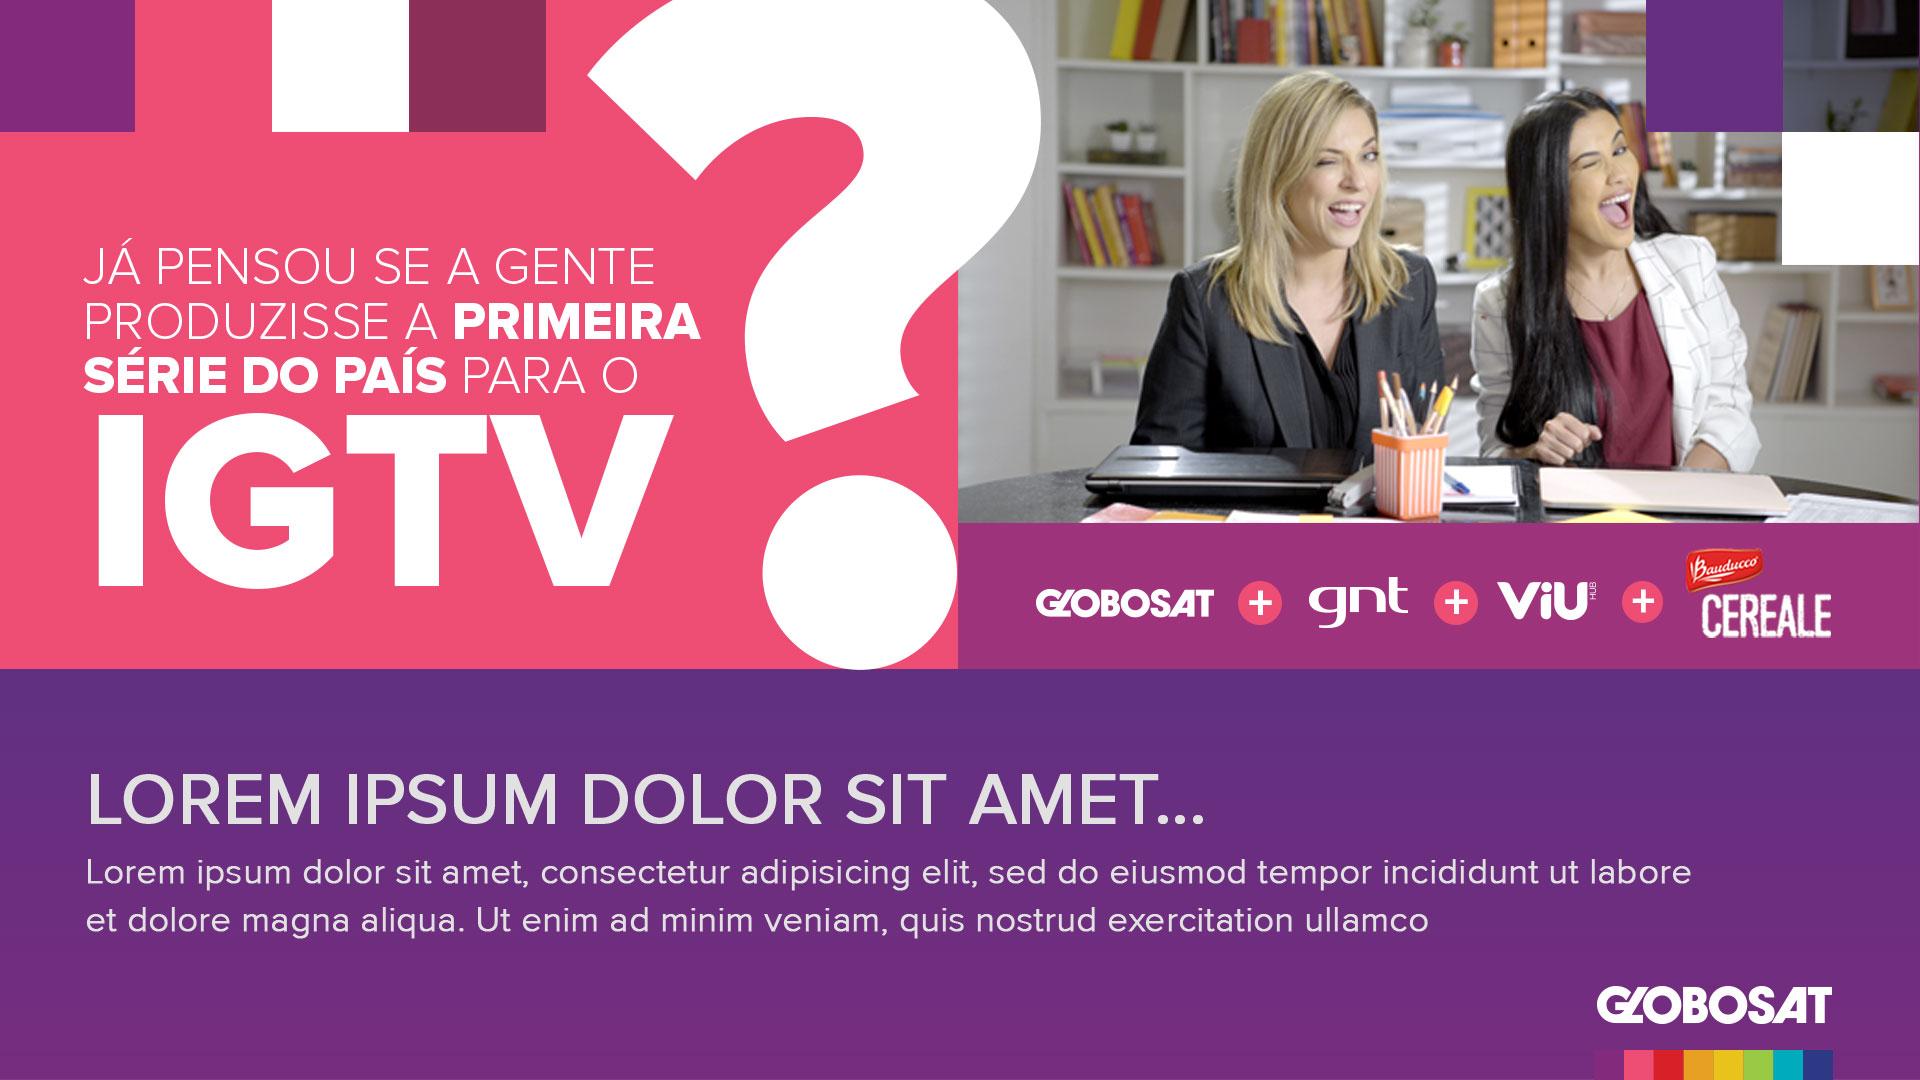 TV GSAT